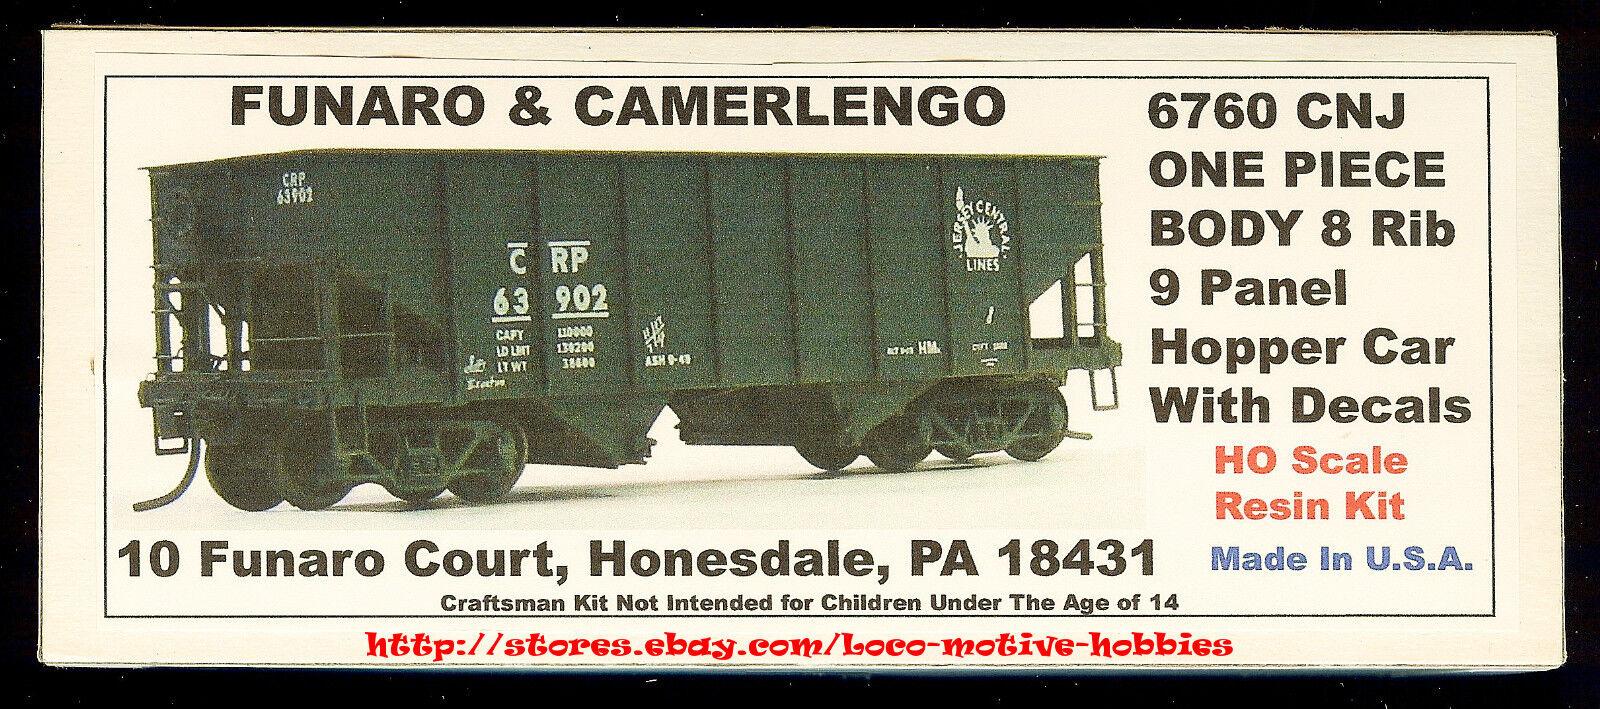 Funaro F&C 6760 CENTRAL NEW JERSEY CNJ Hopper CRP 8-Rib 9-Panel 1-PIECE BODY Kit